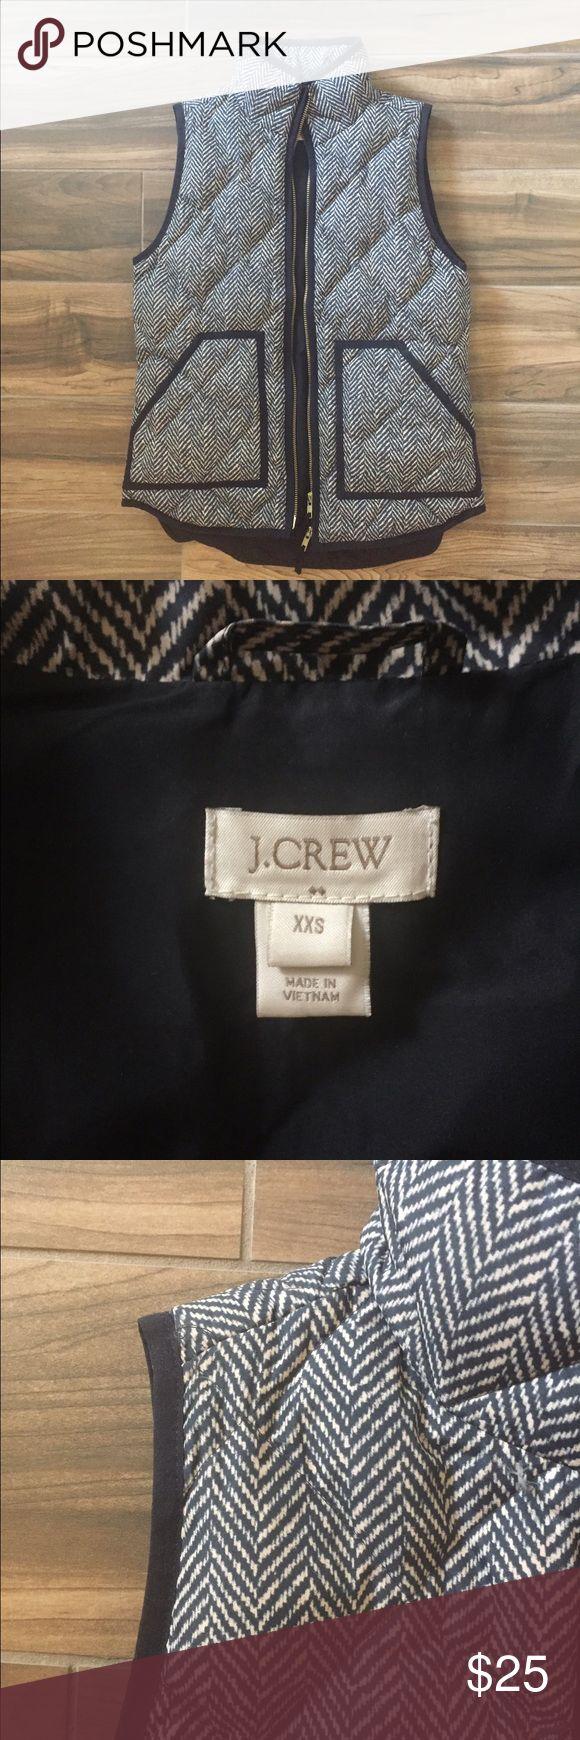 J Crew Factory Puffer Vest J Crew Factory Puffer Vest in herringbone pattern. Worn once. J. Crew Factory Jackets & Coats Vests